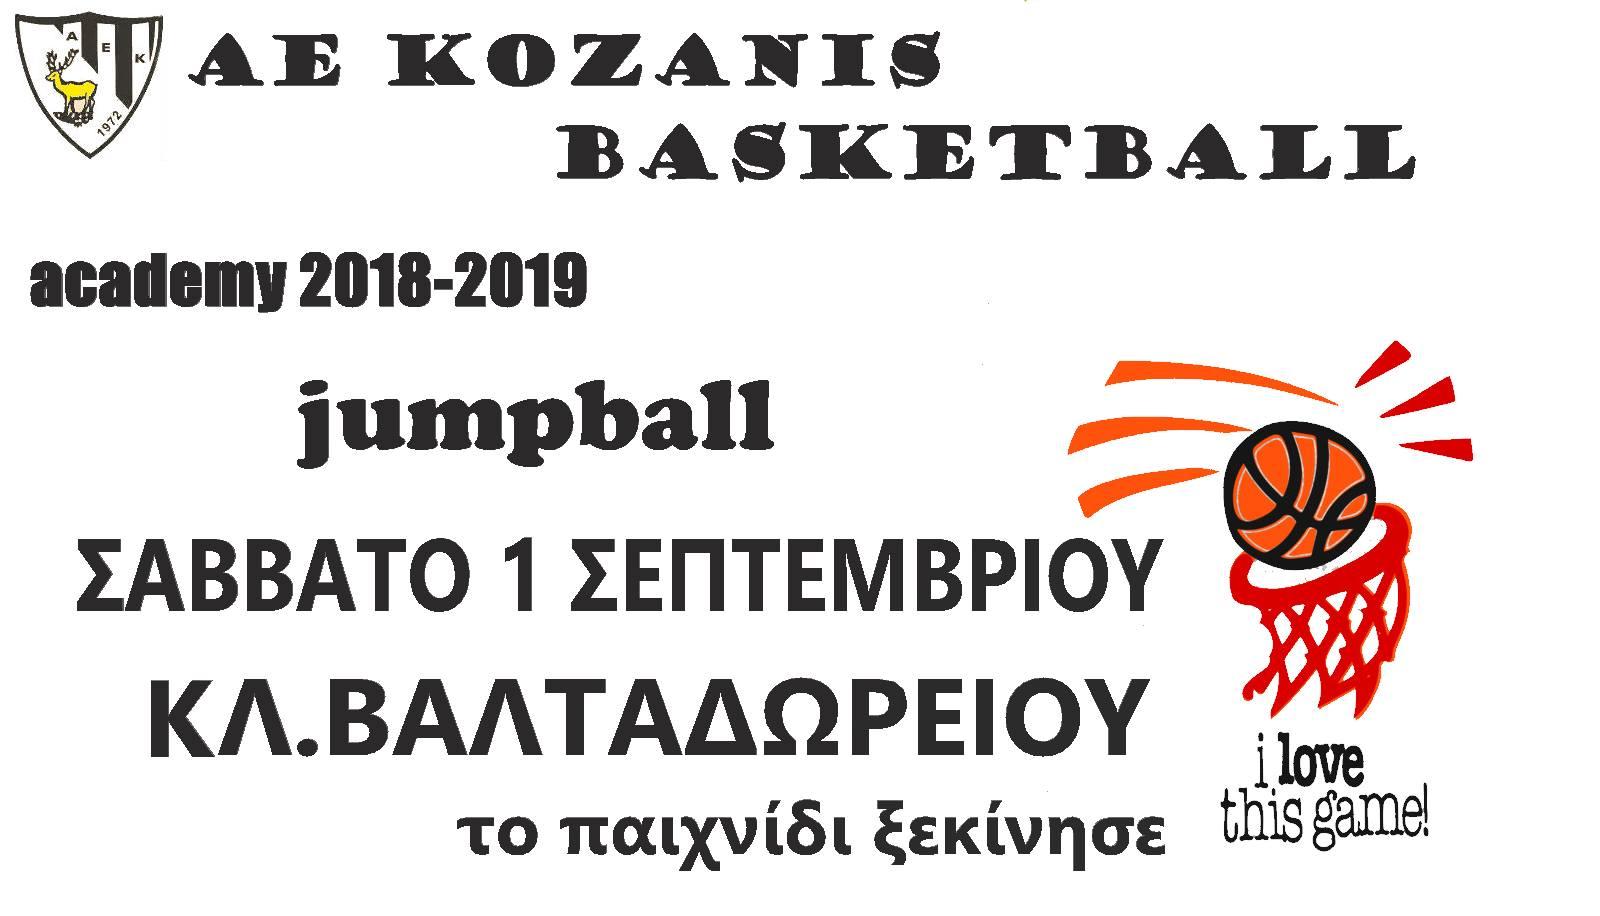 AEK-Basketball-Academy-2018-19-Enarxh.jpg